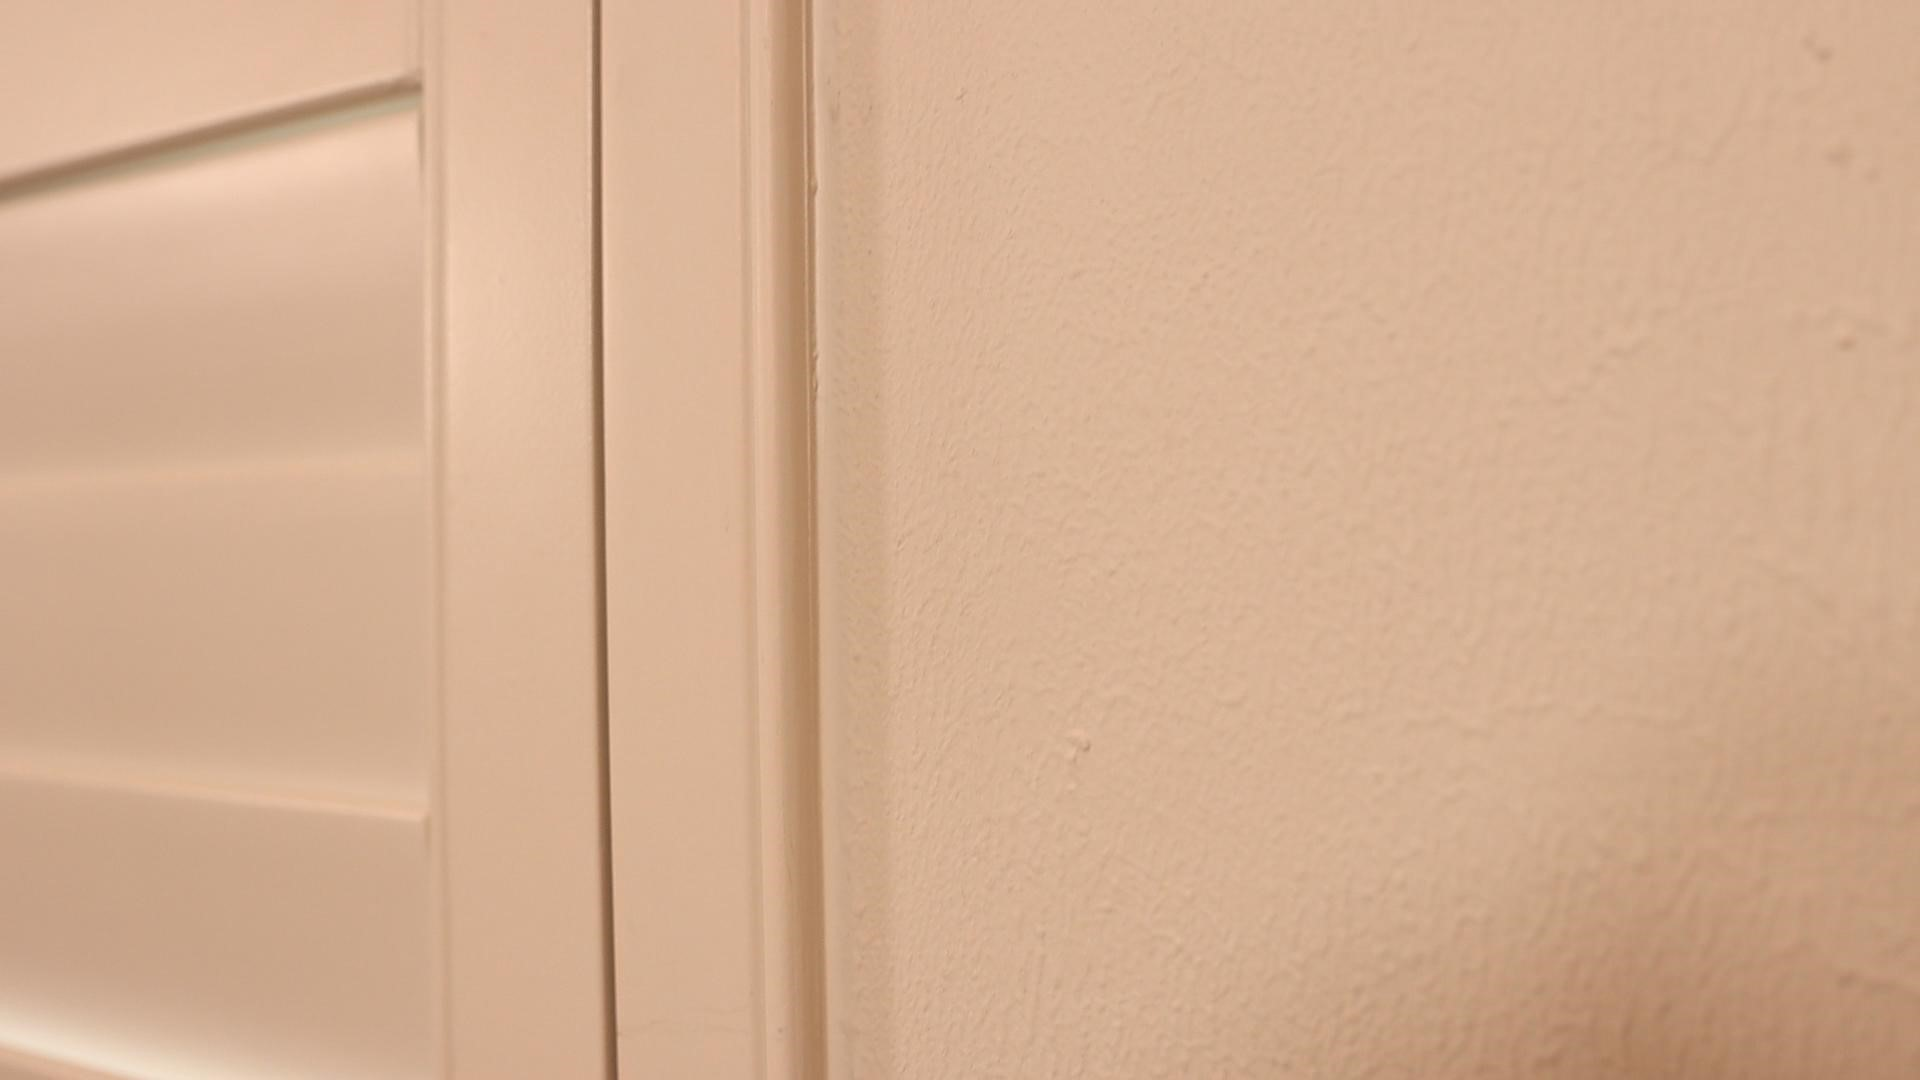 Close-up of a matte wall paint finish